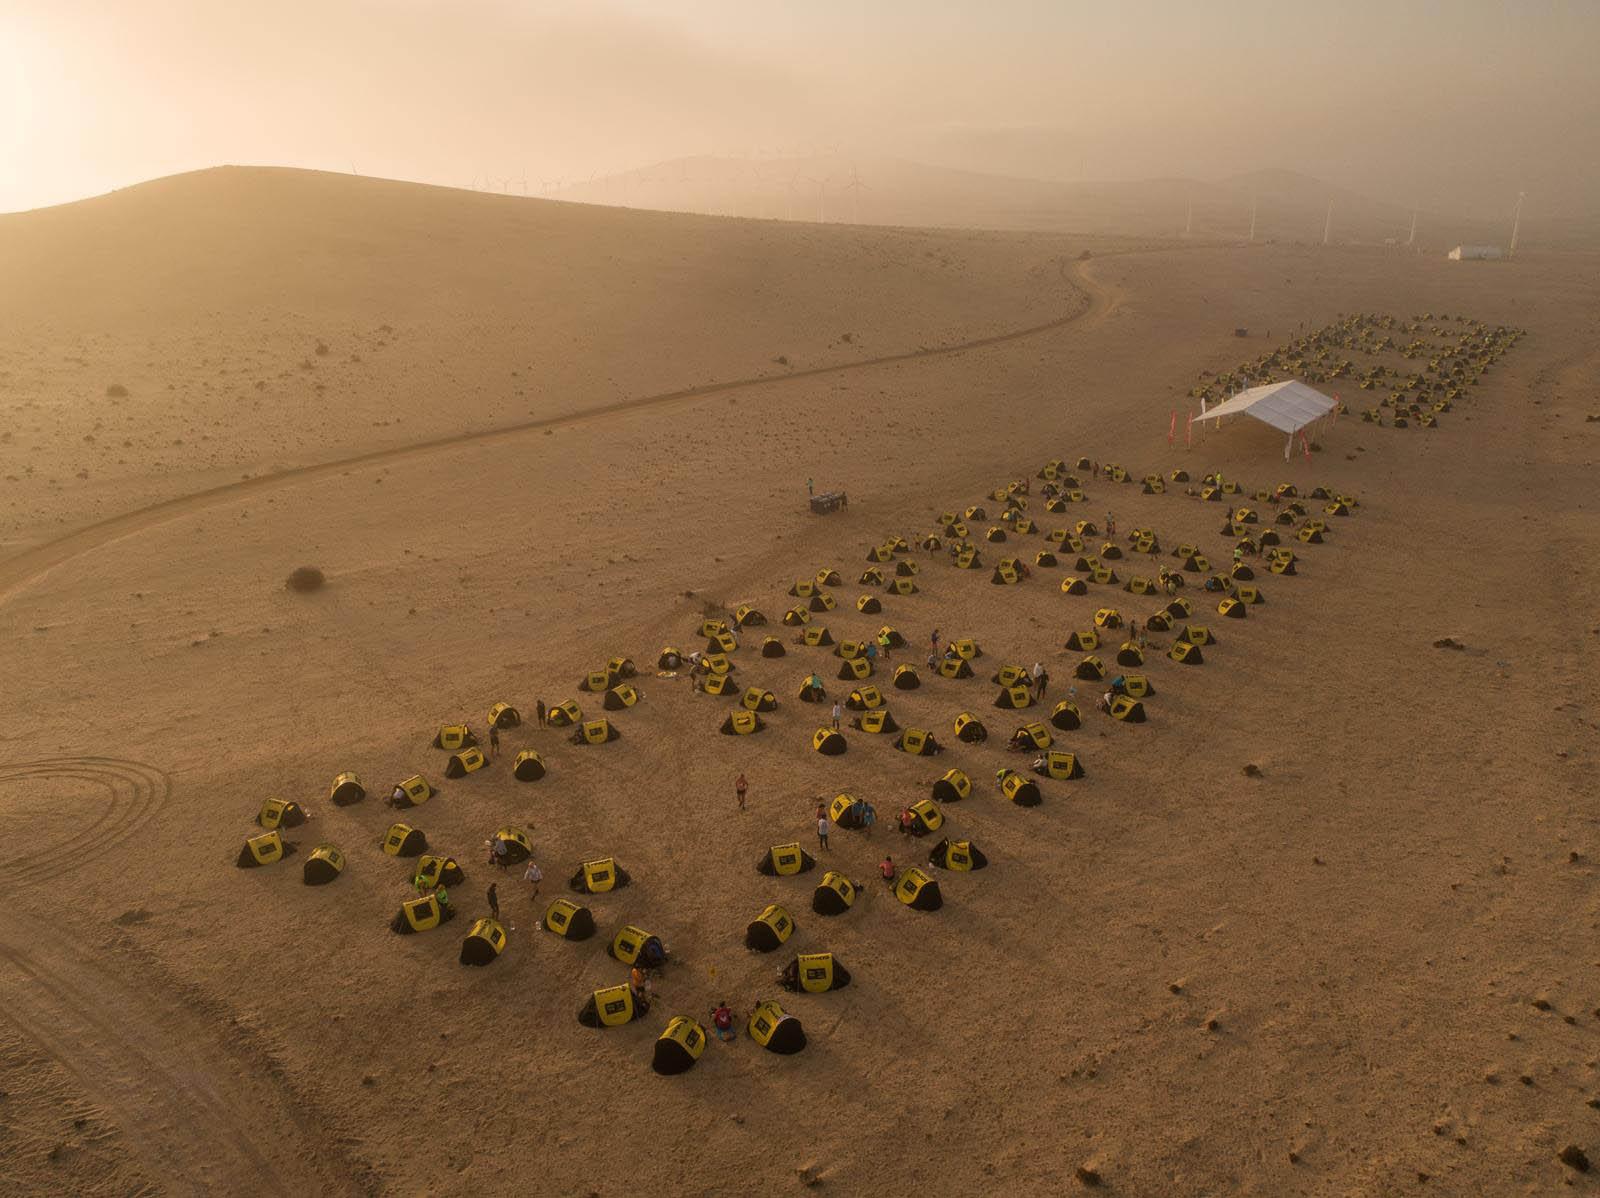 Vista aérea do acampamento do Half Marathon des Sables Fuerteventura